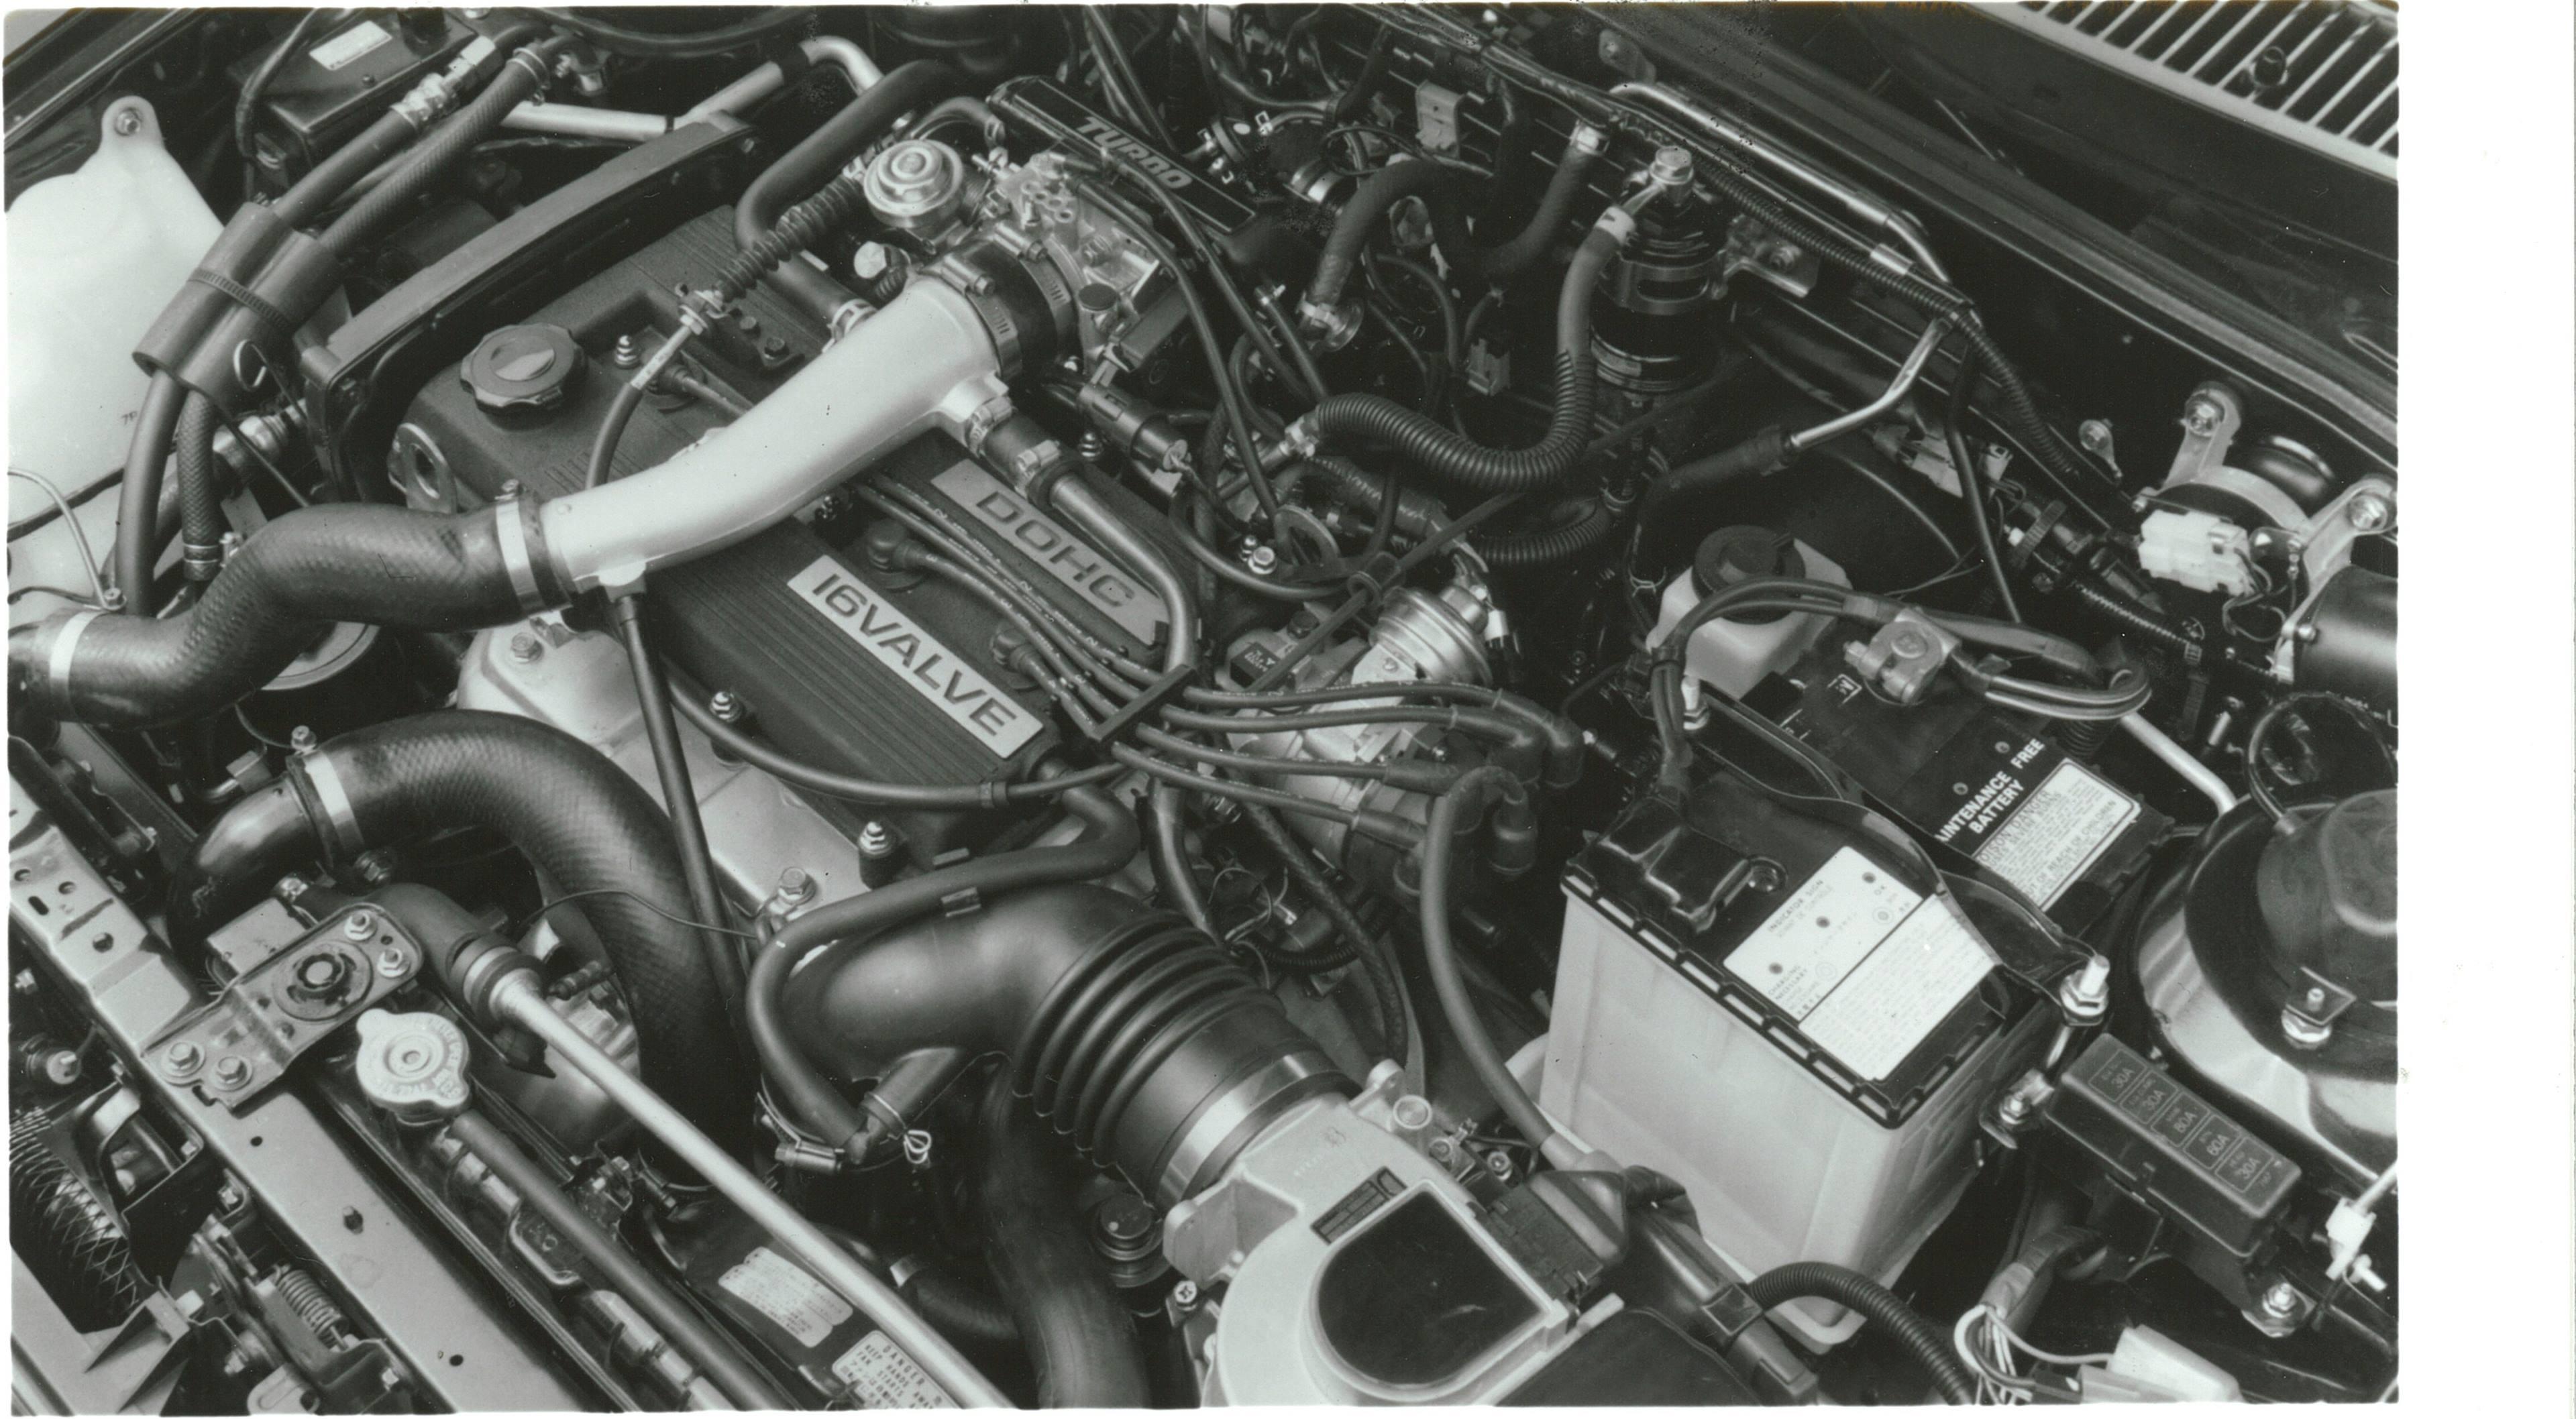 1988 Mazda 323 GTX Engine